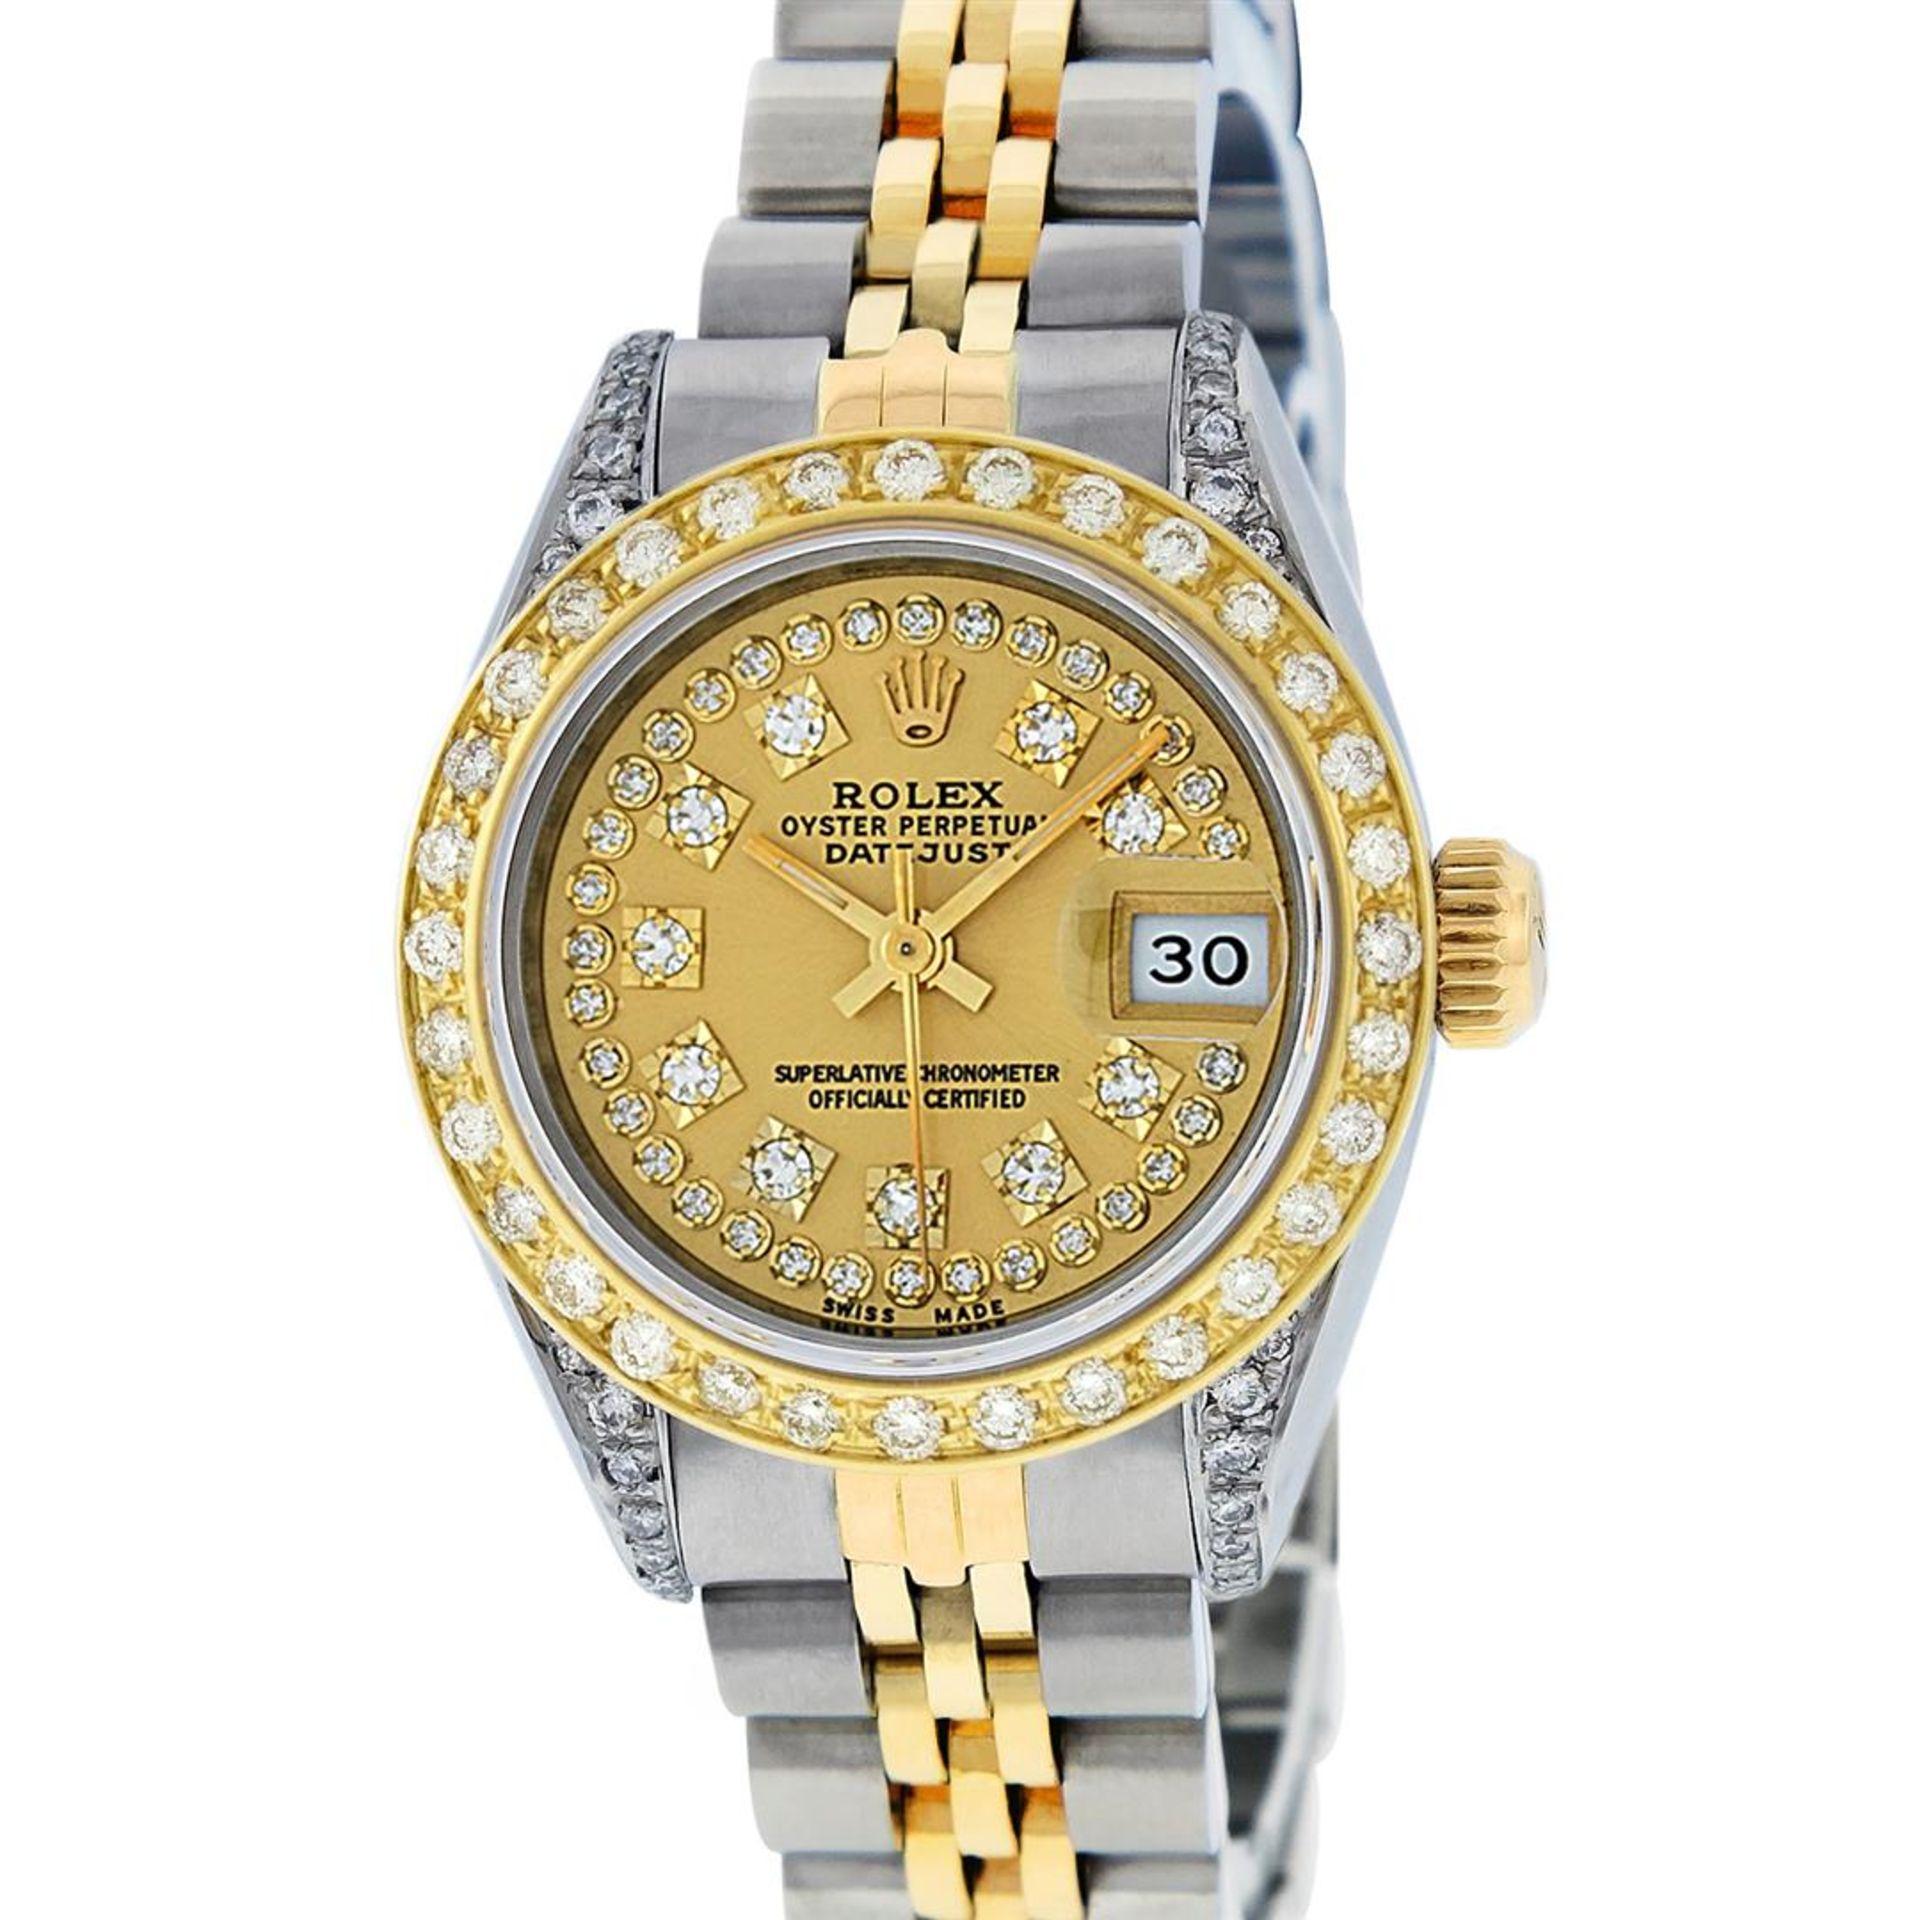 Rolex Ladies 2 Tone 18K Champagne String Diamond Lugs Datejust Wristwatch - Image 2 of 7